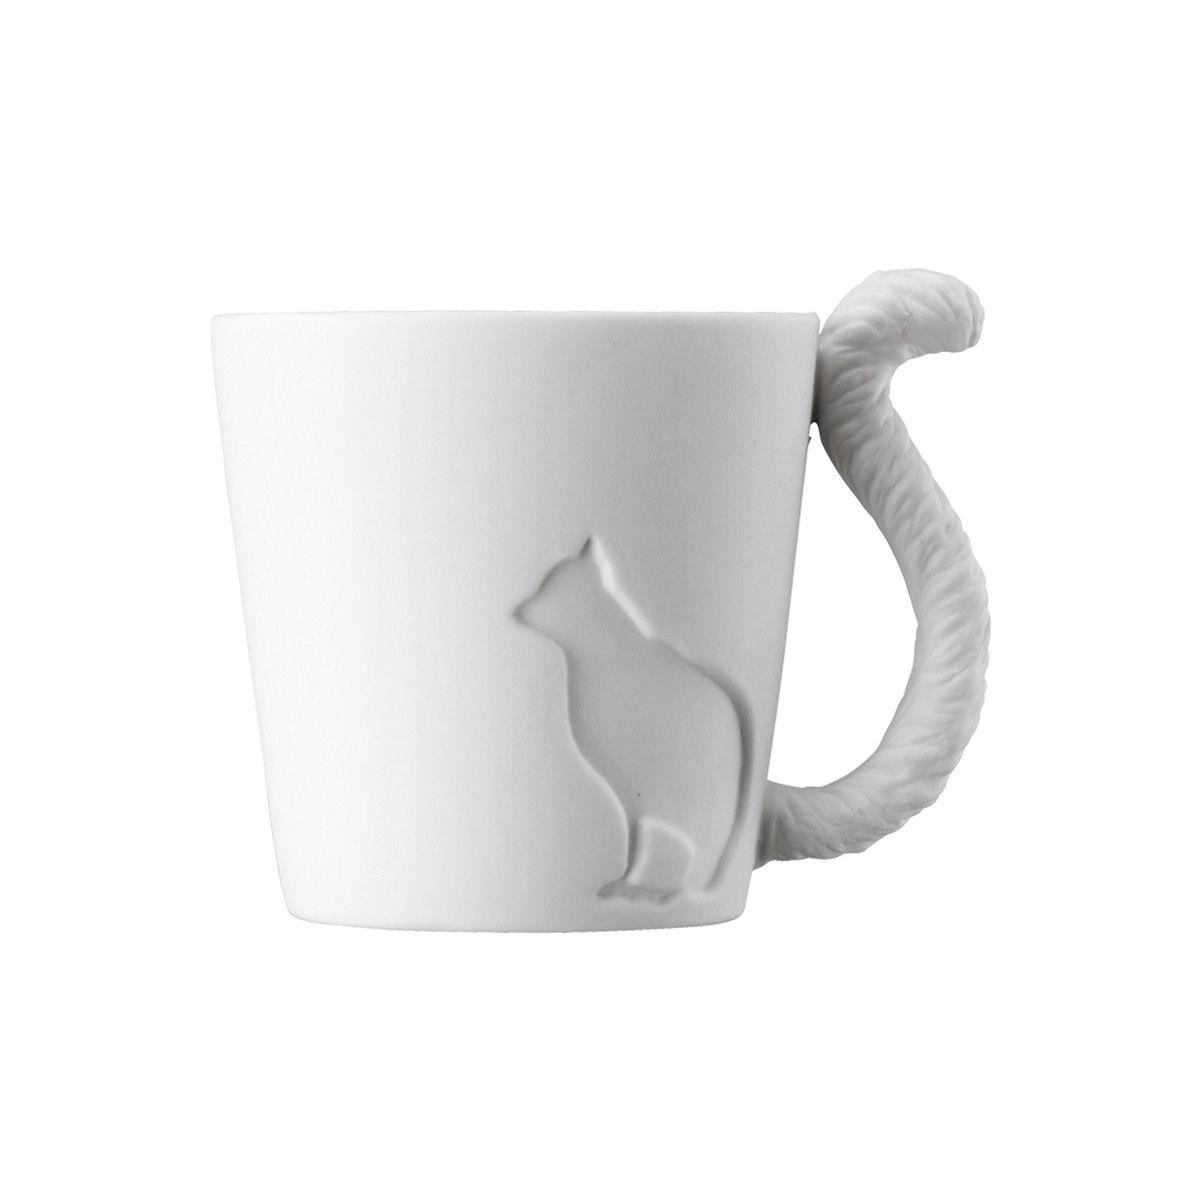 Mugtail Cat Set | Coffee | Pinterest | Gato, Cerámica y Quiero